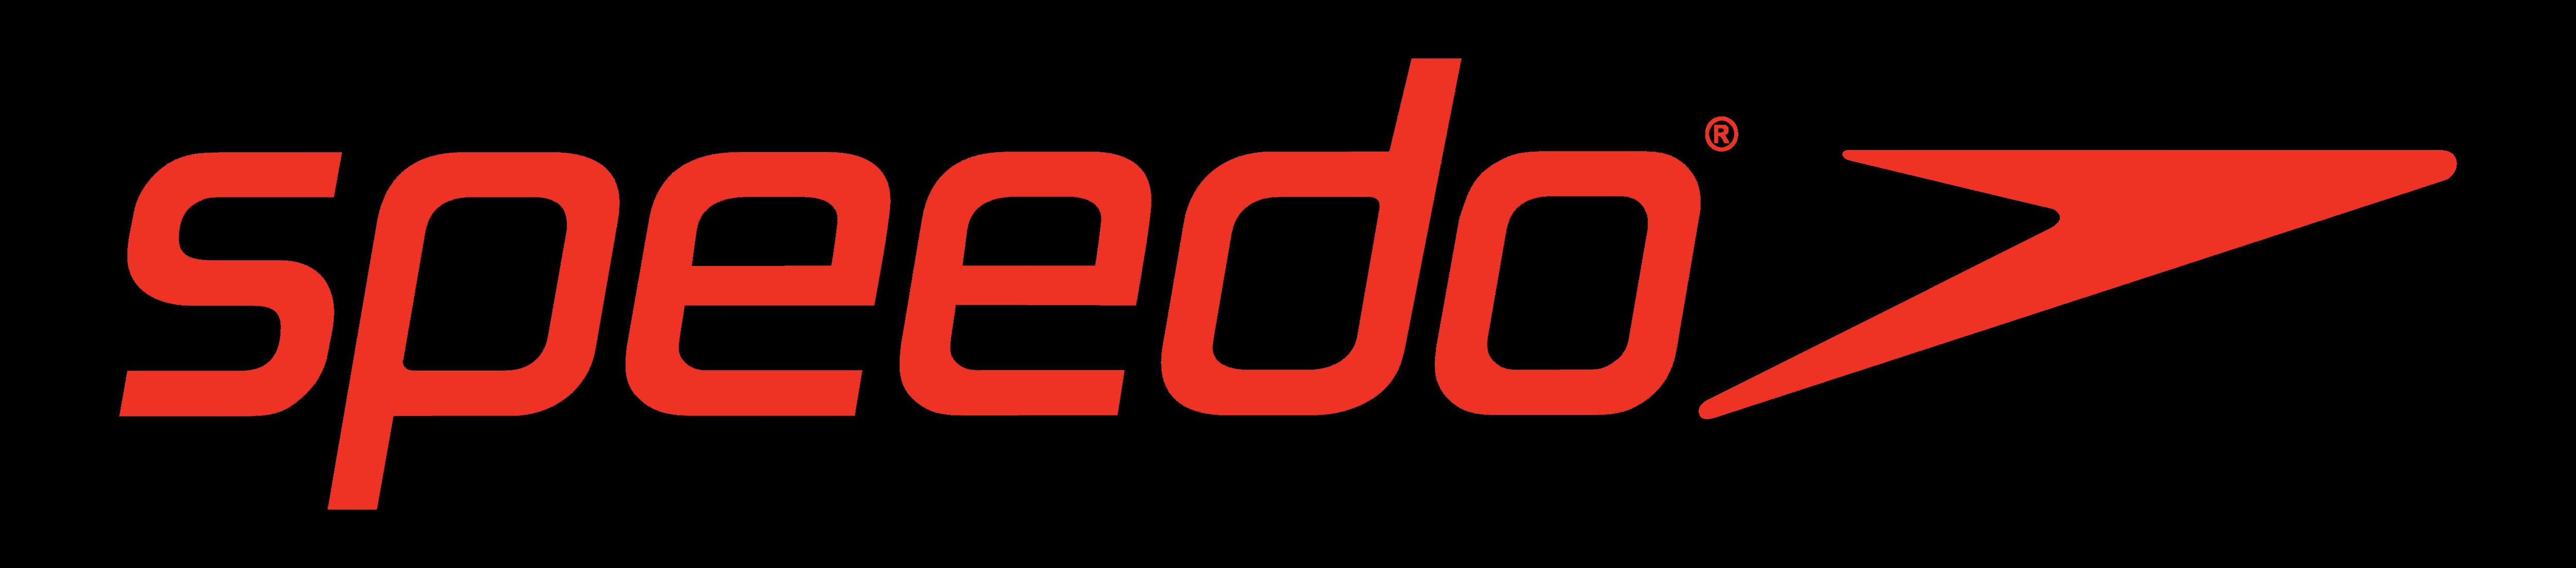 Speedo – Logos Download